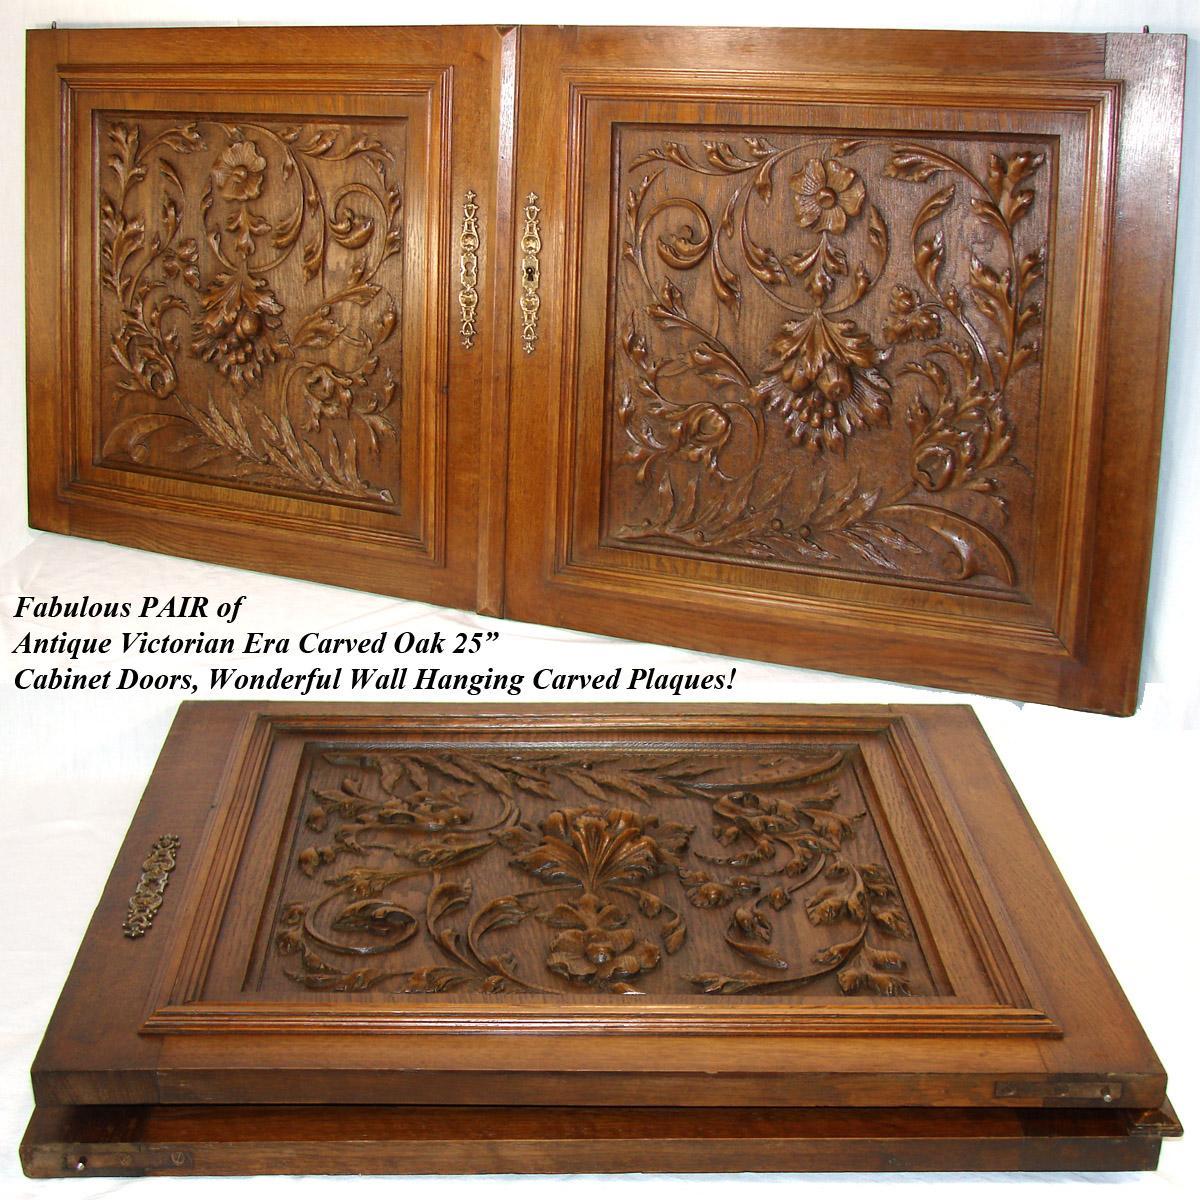 25 antique victorian brack forest style oak cabinet or furniture door